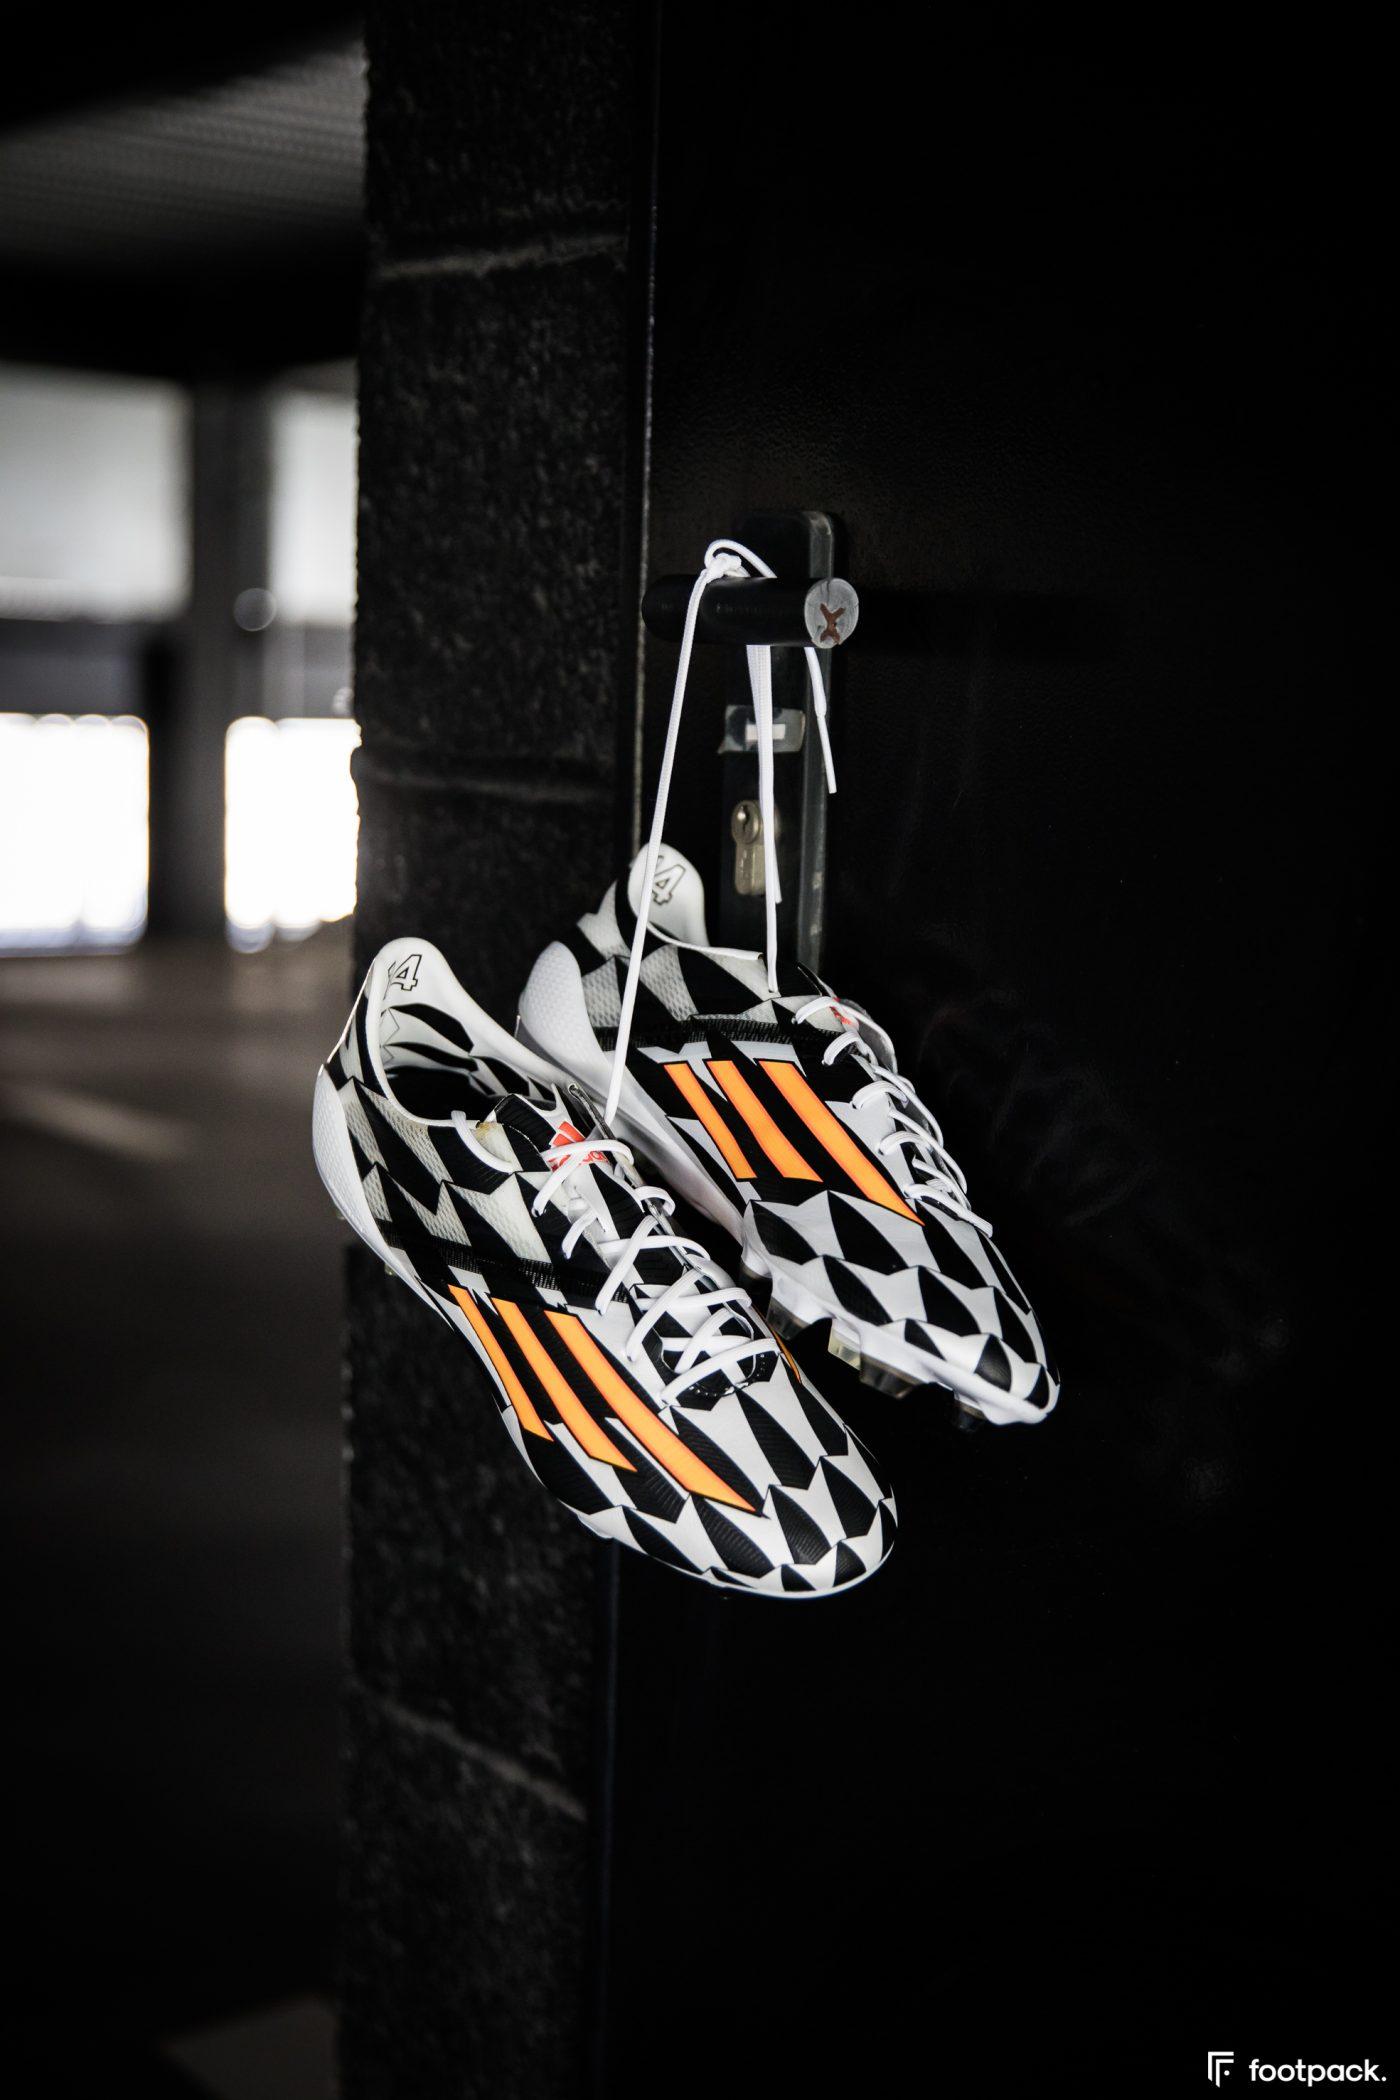 adidas-F50-adizero-battle-pack-coupe-du-monde-2014-footpack-11